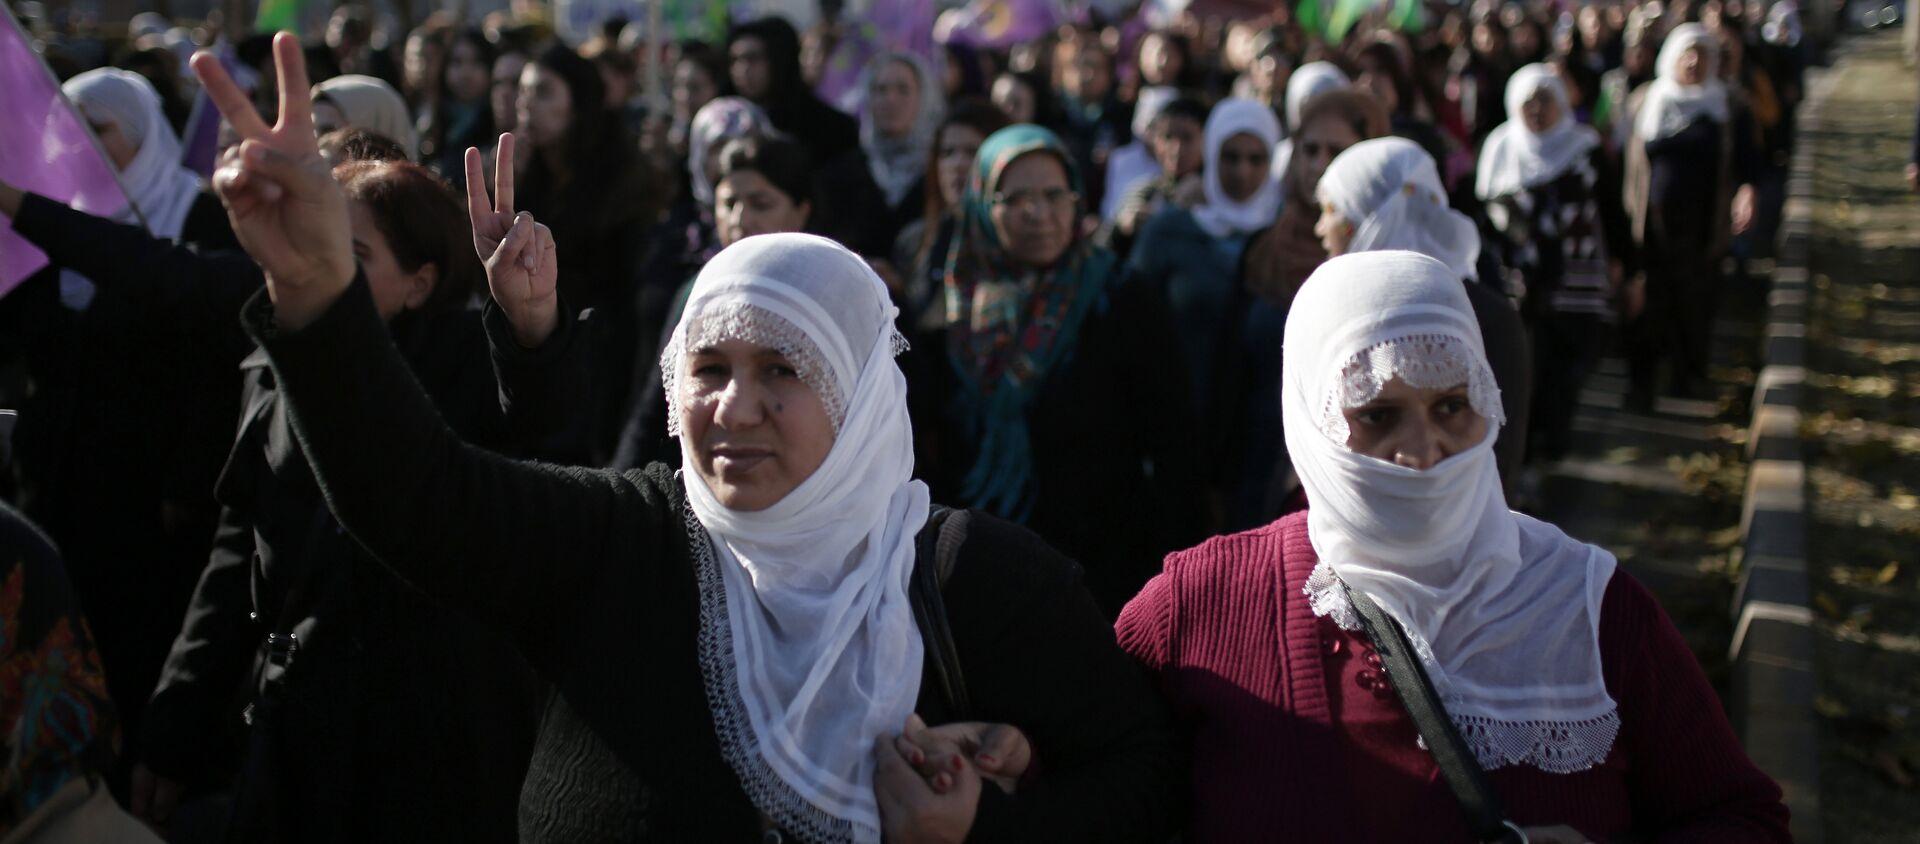 Women march during a protest denouncing violence, in Diyarbakir, Turkey, Friday, Dec. 25, 2015. (File) - Sputnik Italia, 1920, 20.03.2021